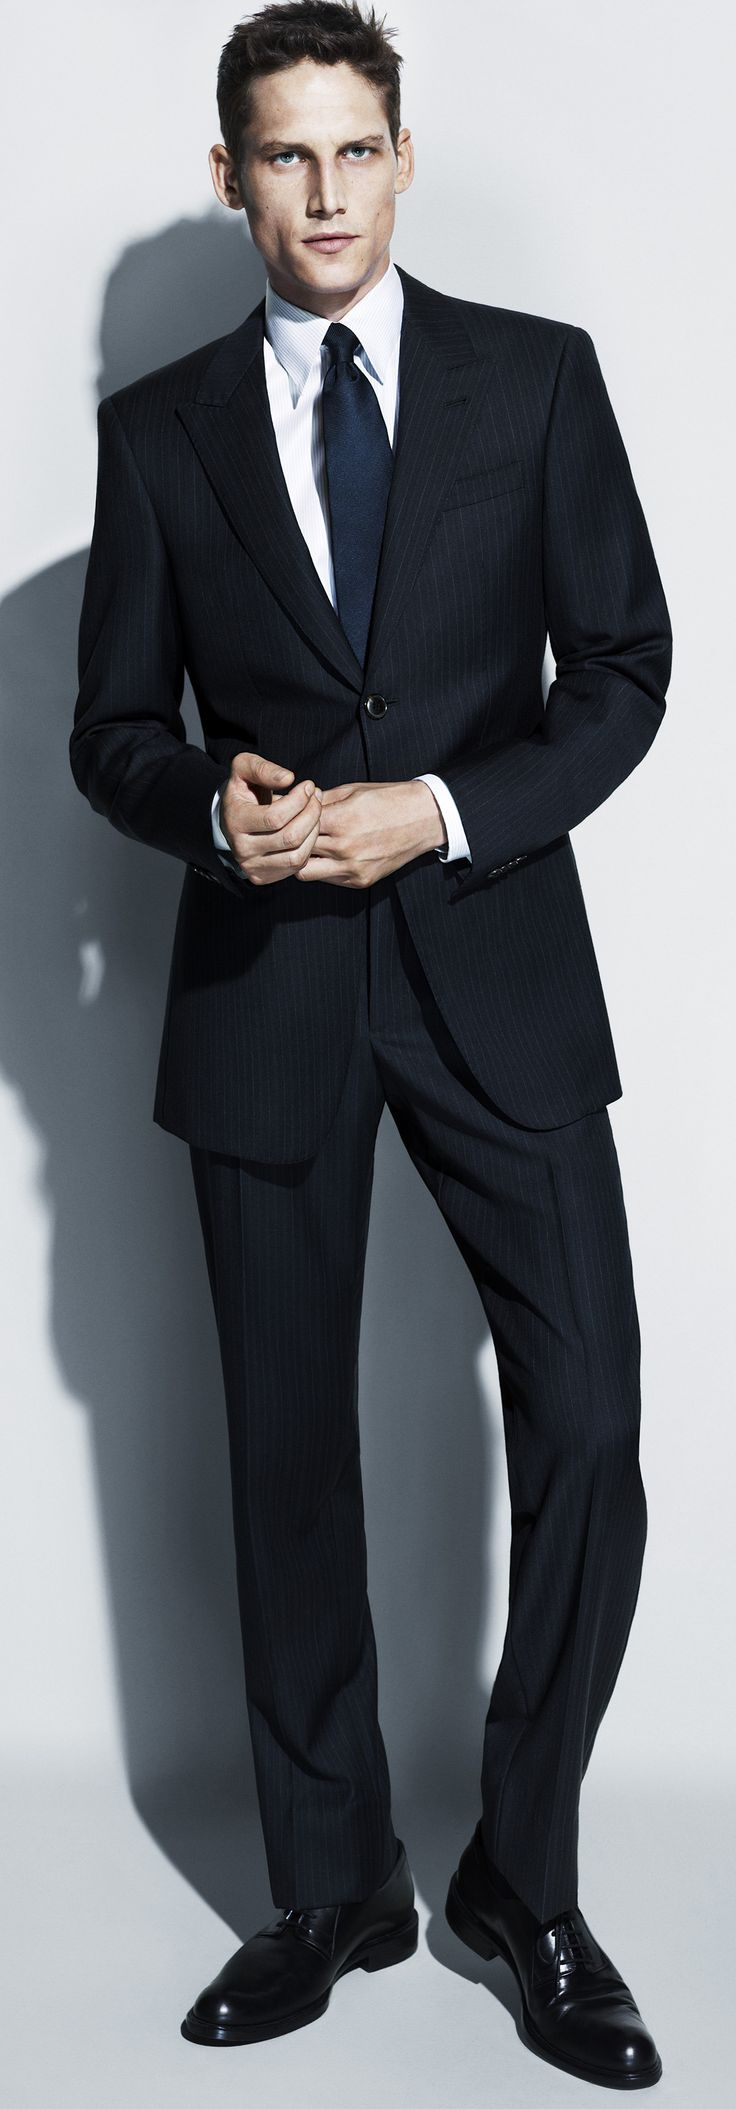 Giorgio Armani Men´s Collection Spring/Summer 2013 - Sportsmanship - GF Luxury.dv.